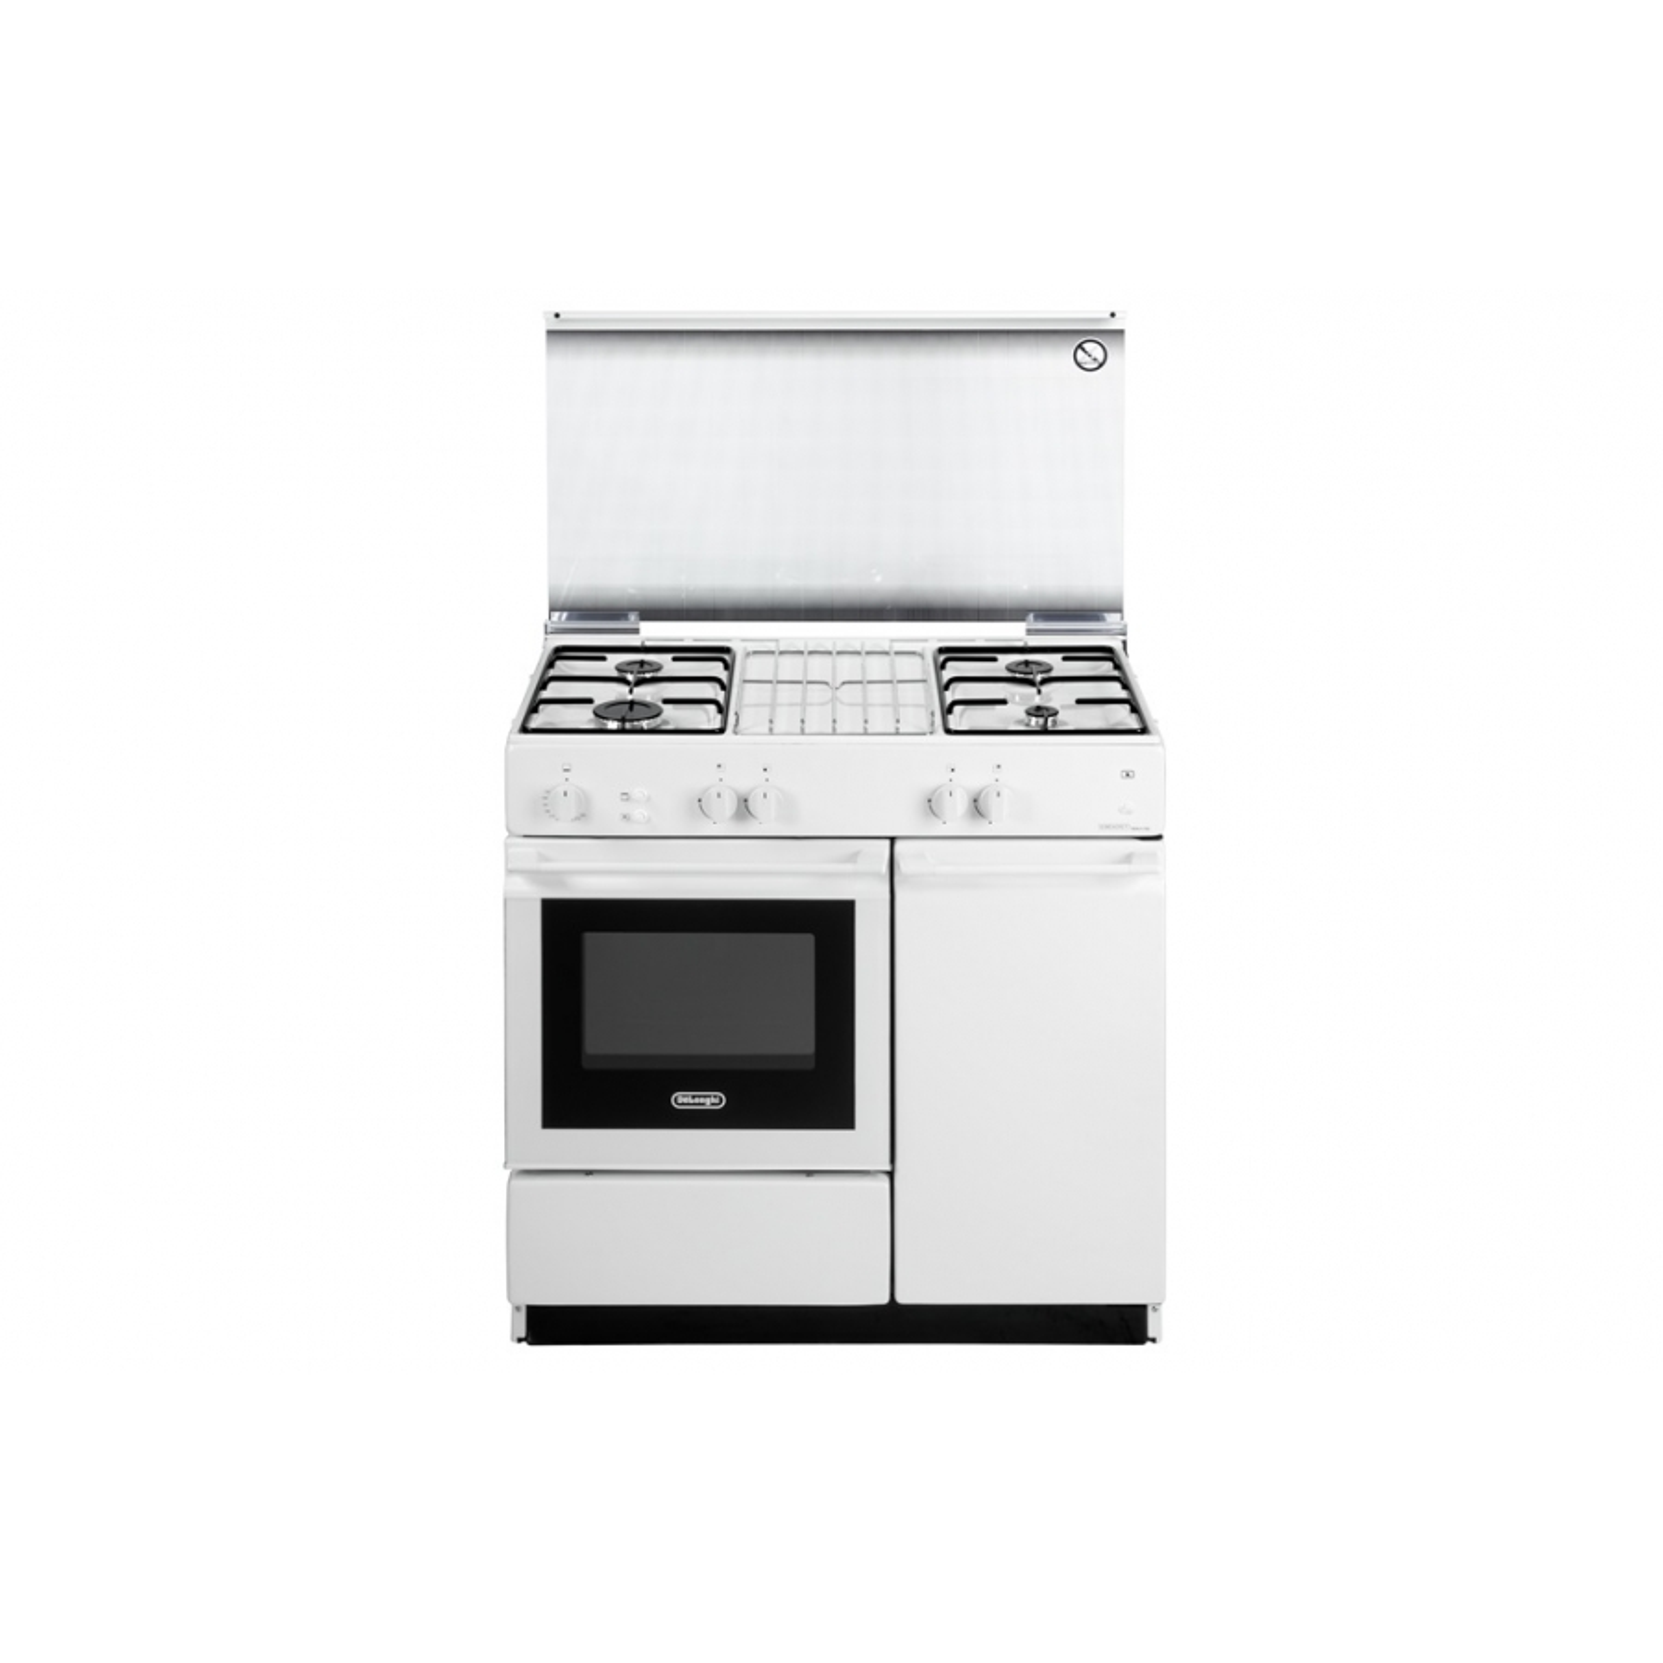 Cucina de longhi sggw854n bianca 86x50 forno a gas con for Stufe a gas metano de longhi